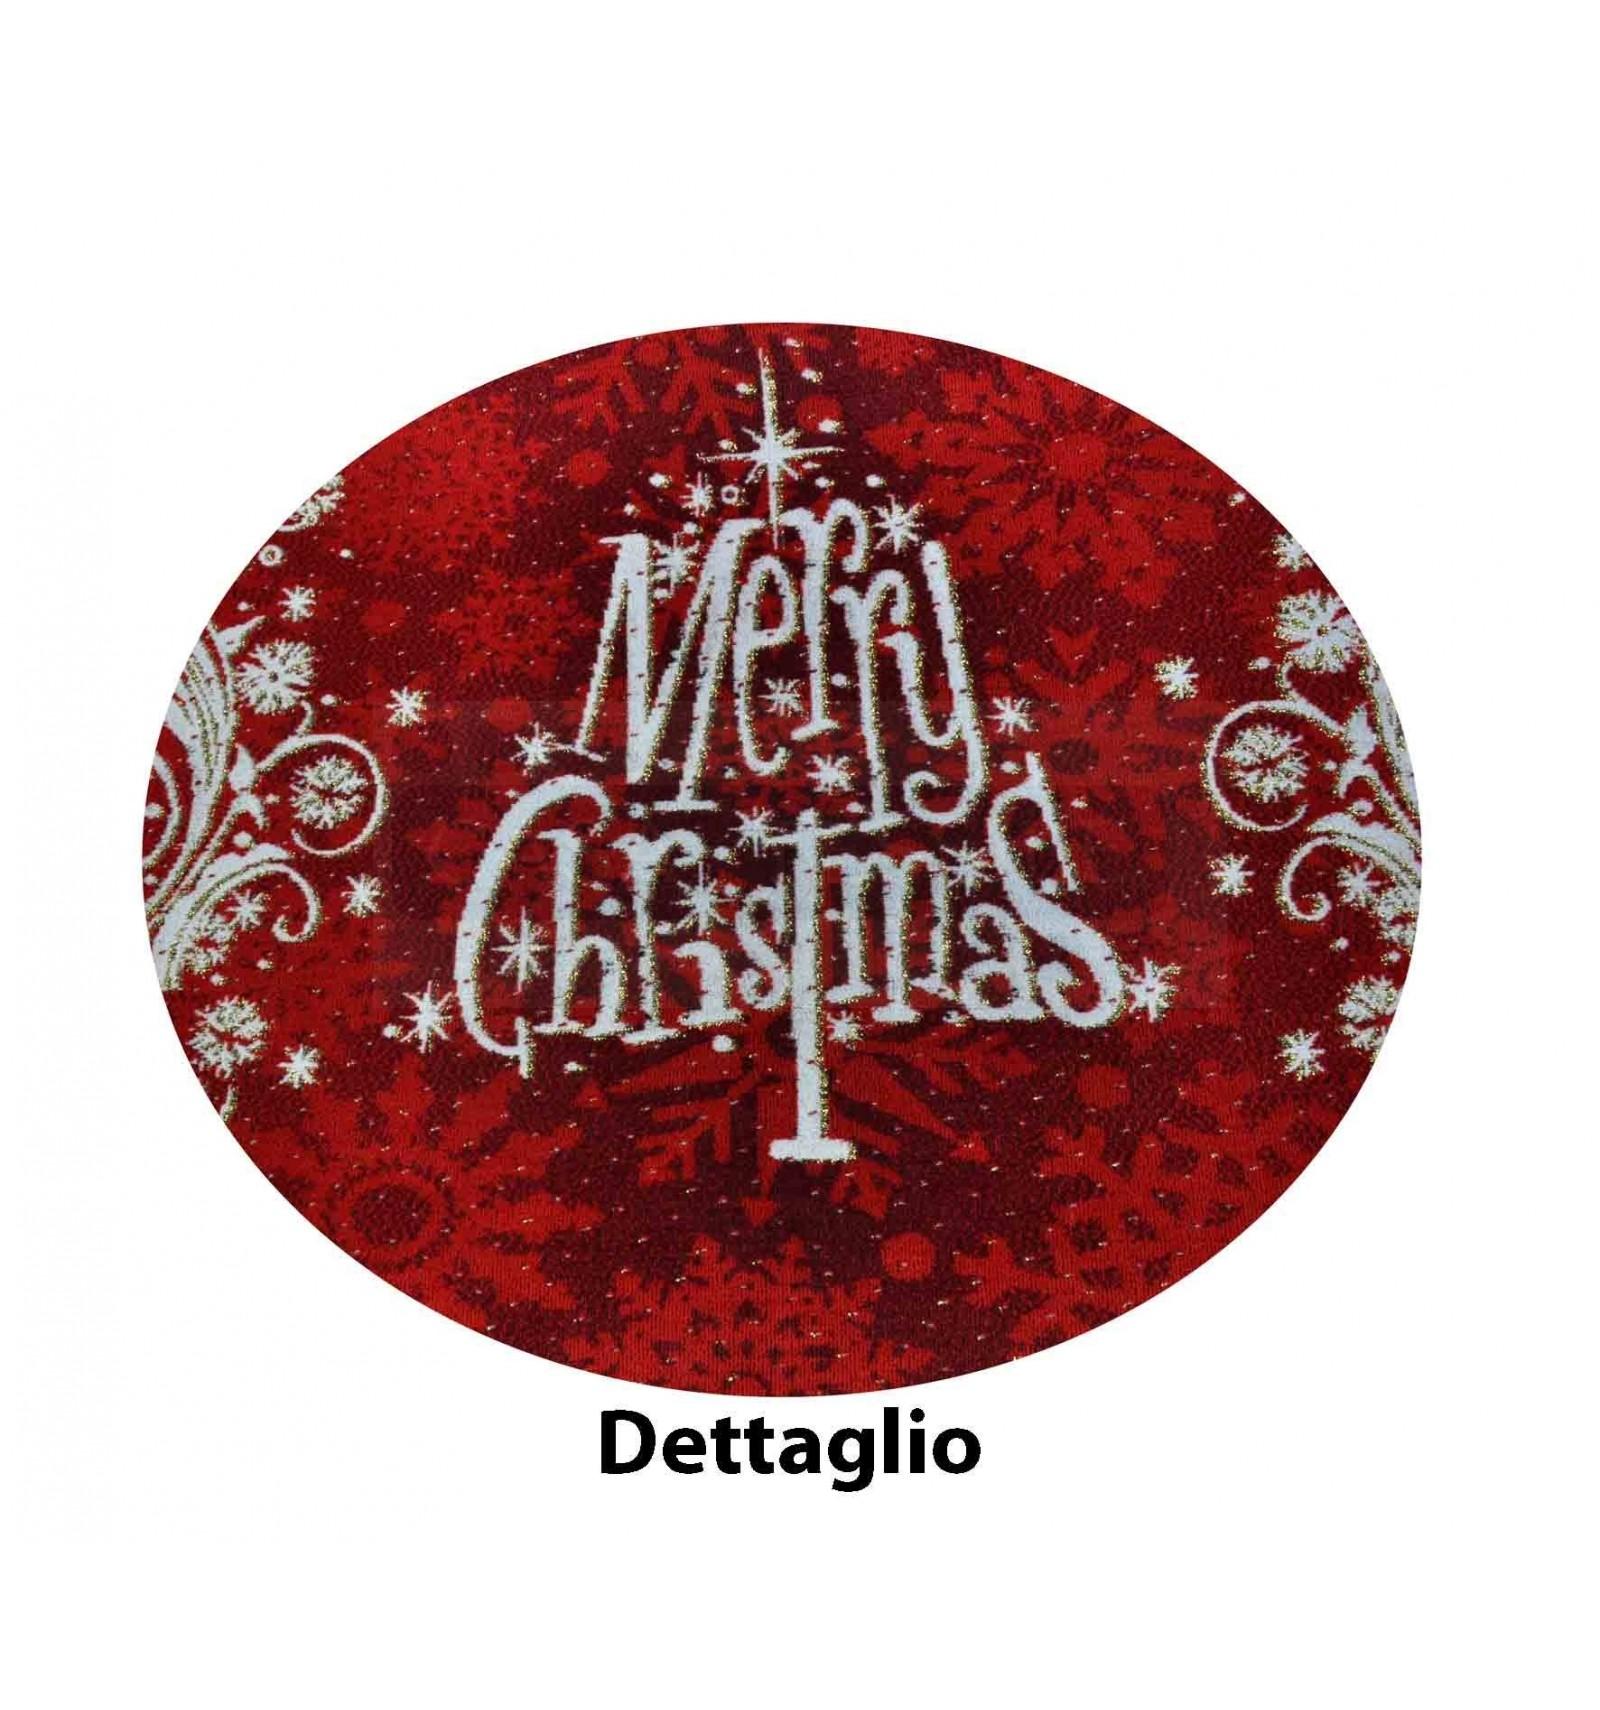 Tappeto-MERRY-CHRISTMAS-passatoia-67x105-cm miniatura 9